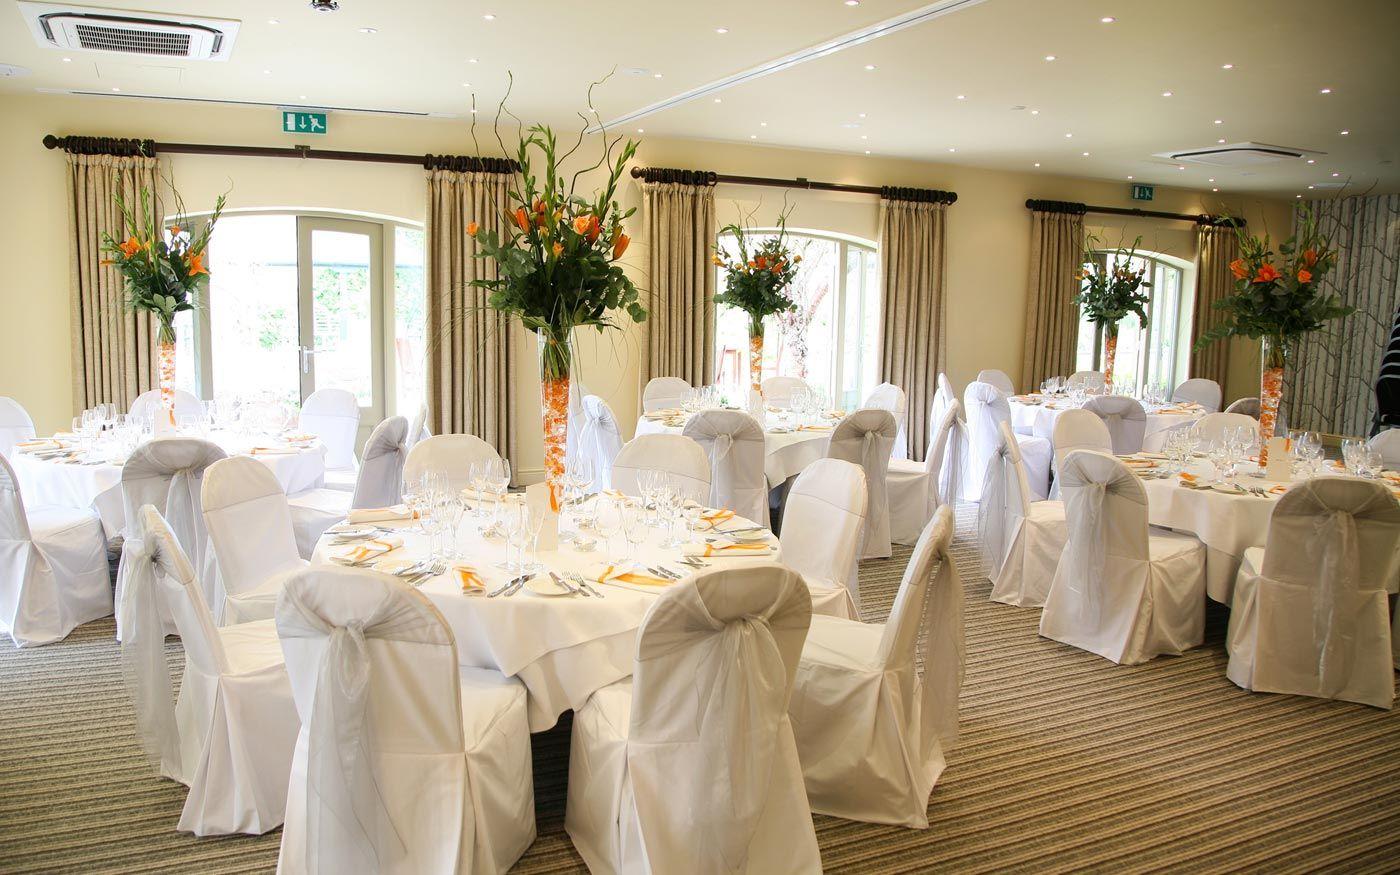 Manor House Hotel Moreton In Marsh Wedding Photos Google Search